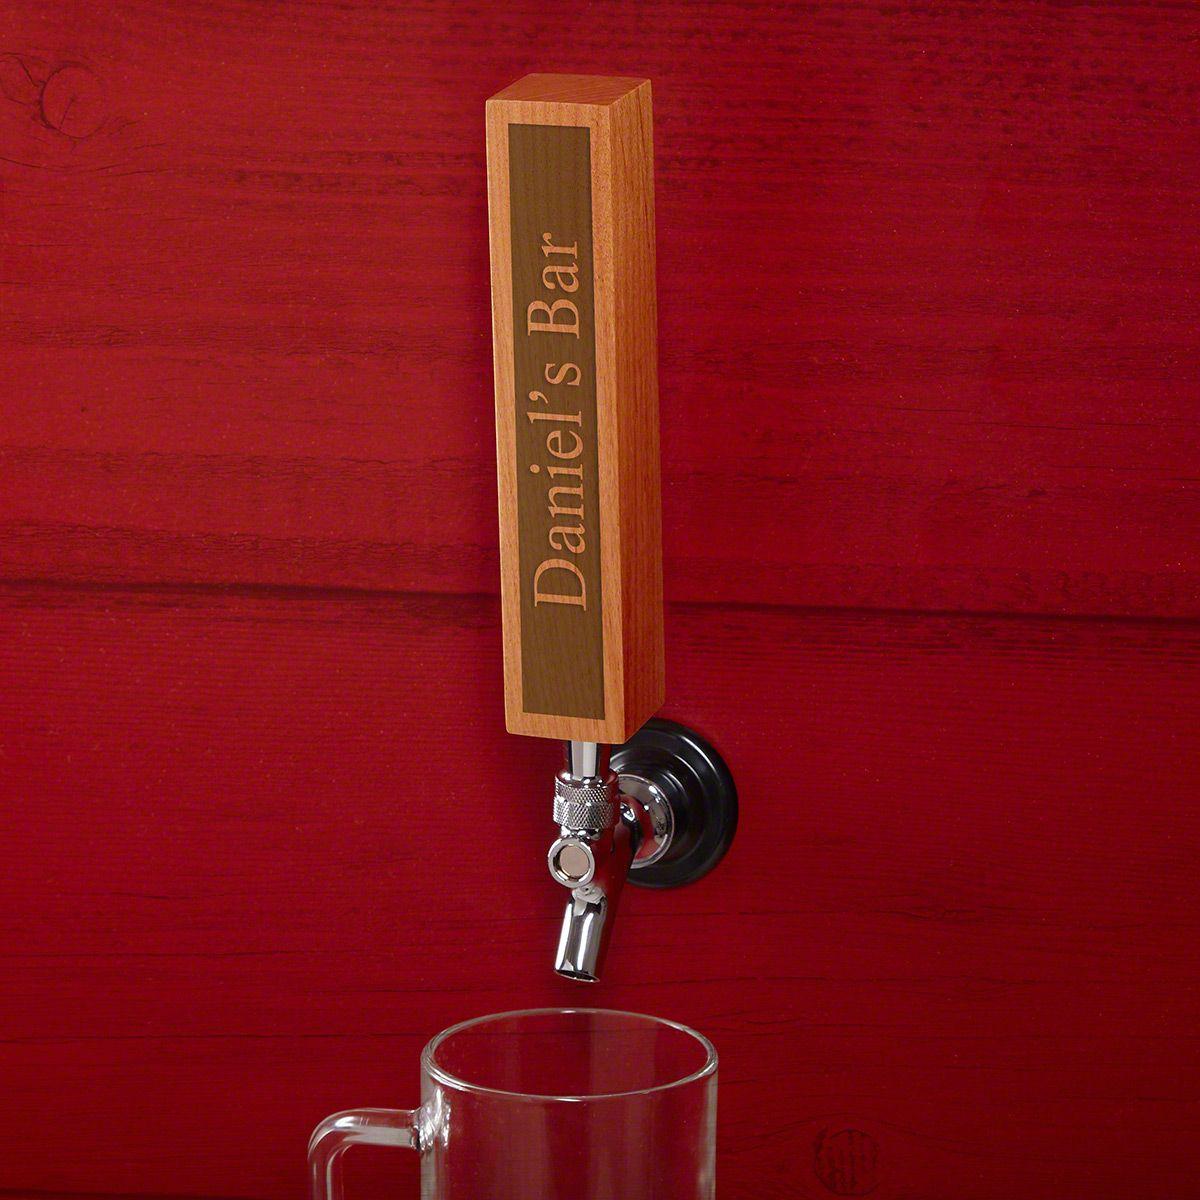 Aldham Personalized Beer Tap Handle